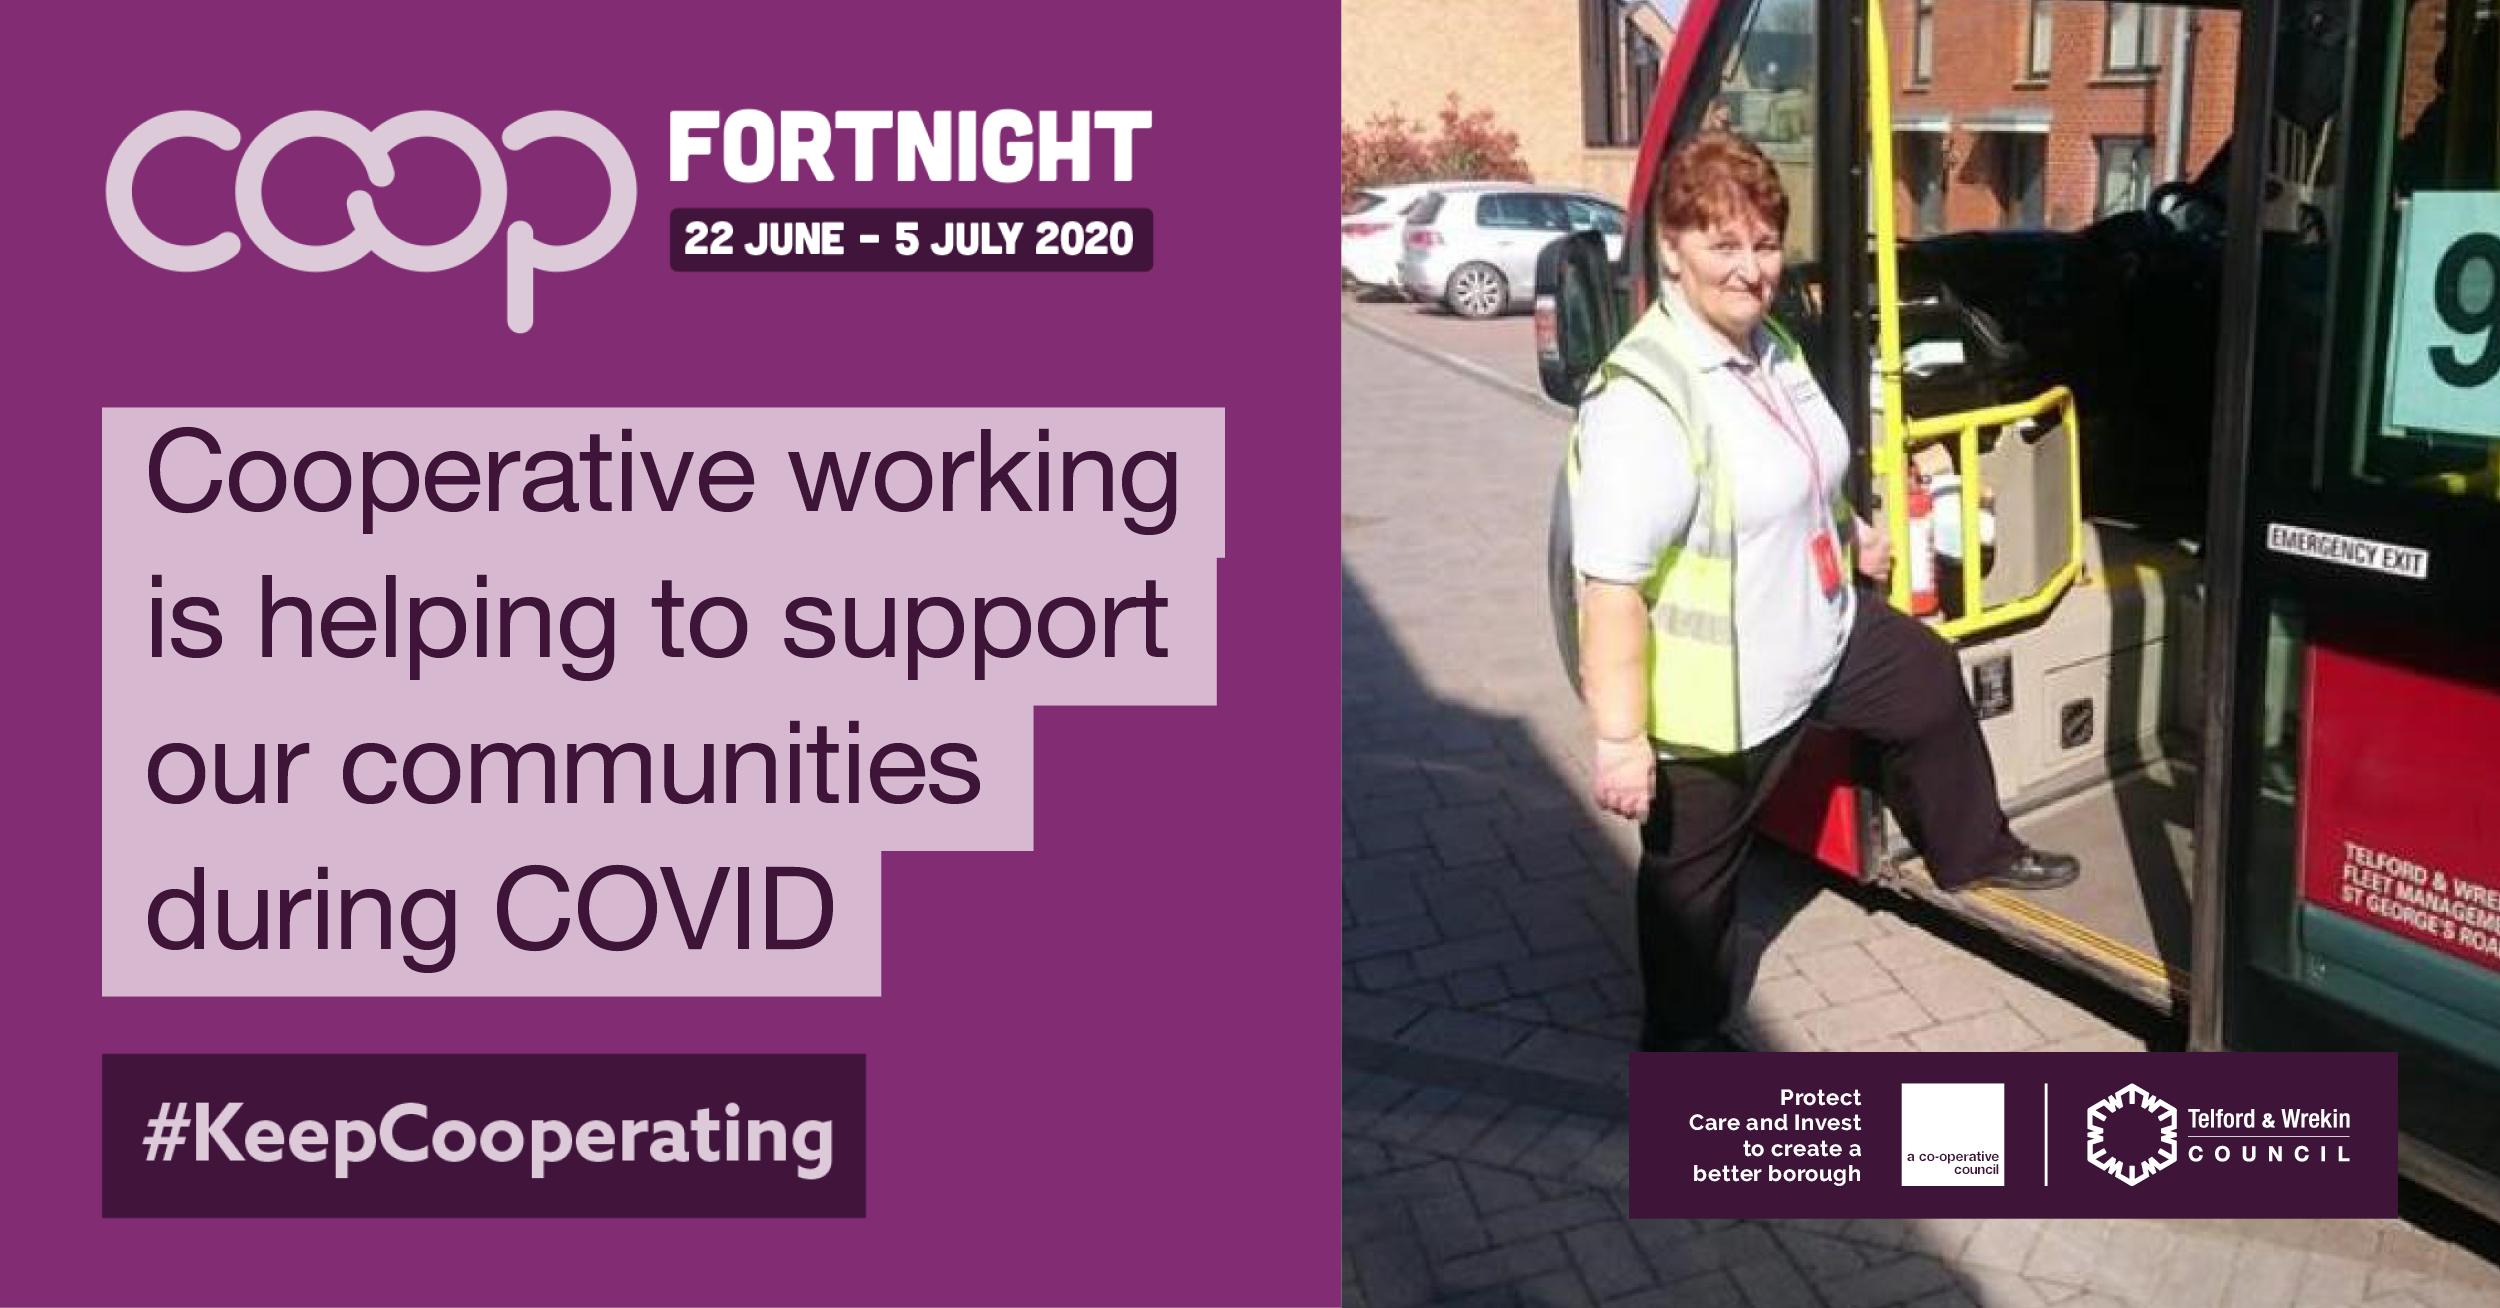 Council celebrates Co-operative Fortnight